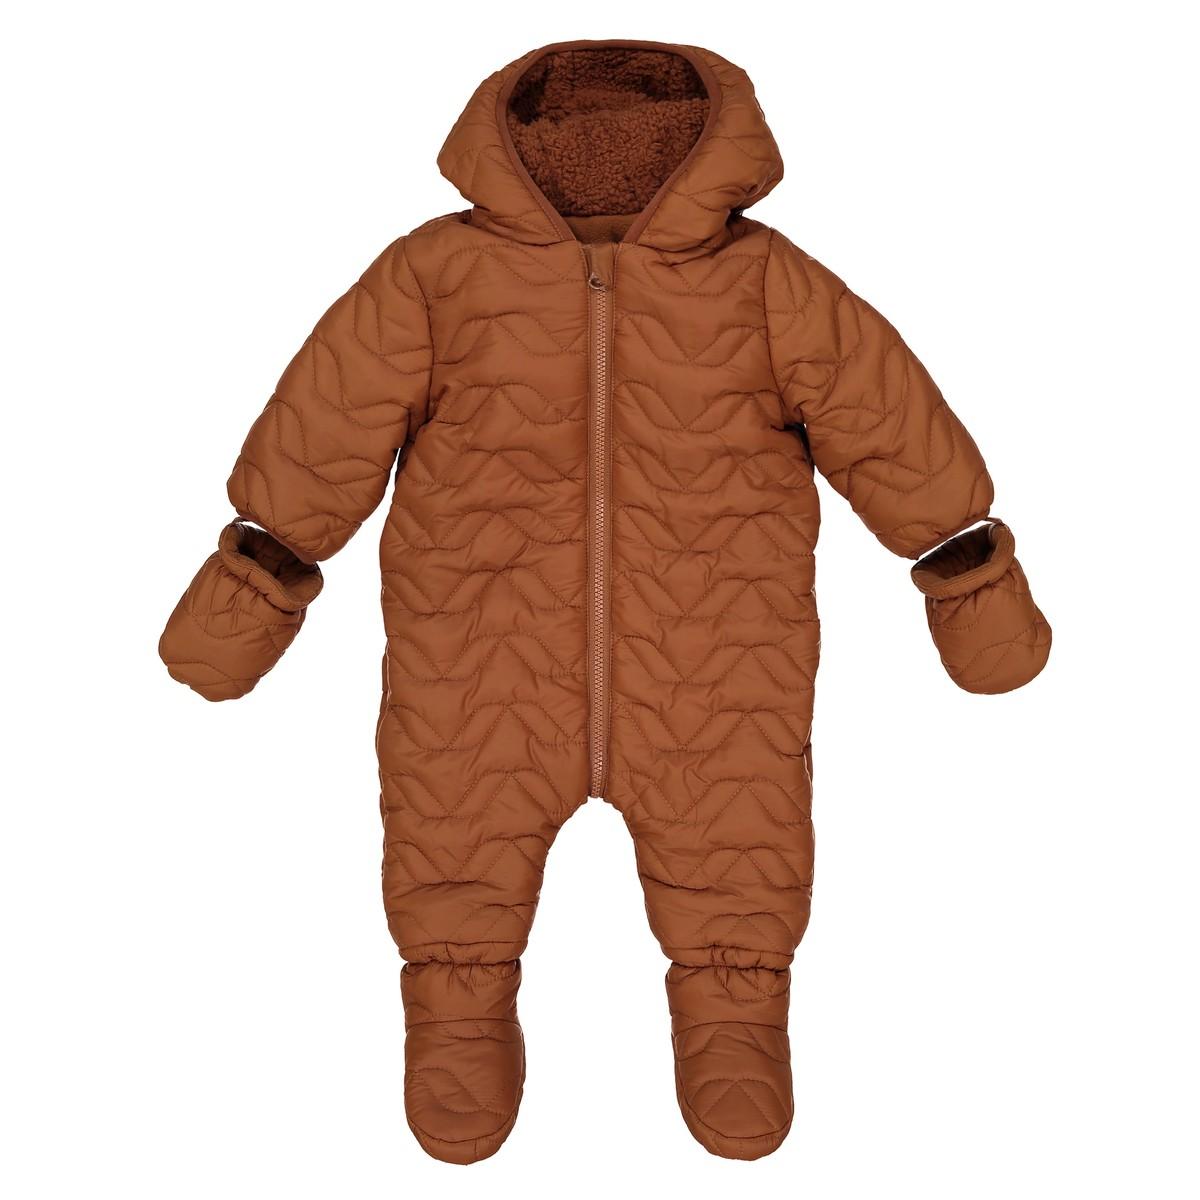 ochre-baby-snowsuit